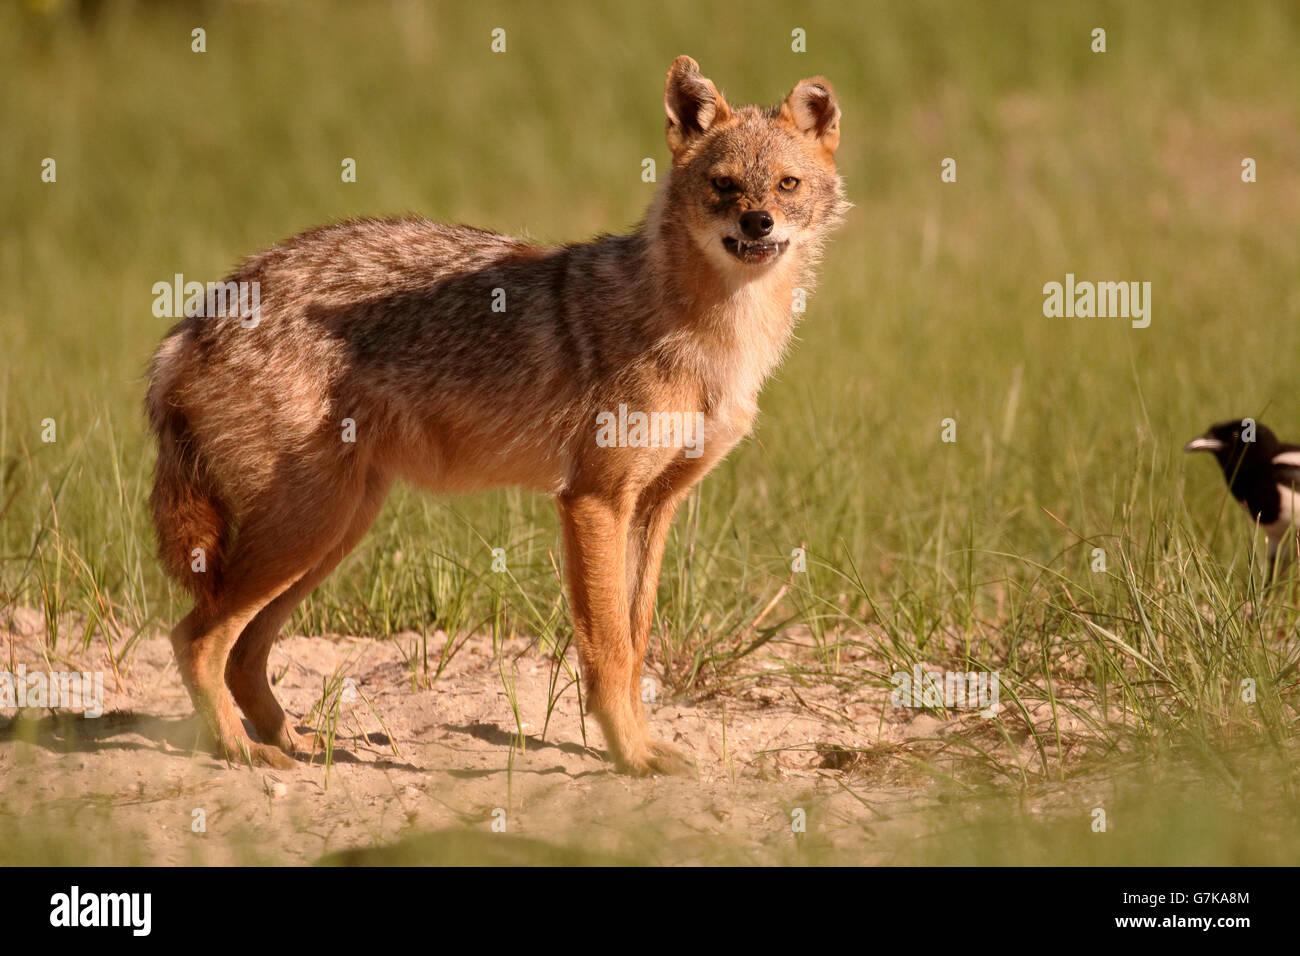 European jackal, Canis aureus moreoticus, Single mammal on grass, Romania, June 2016 Stock Photo